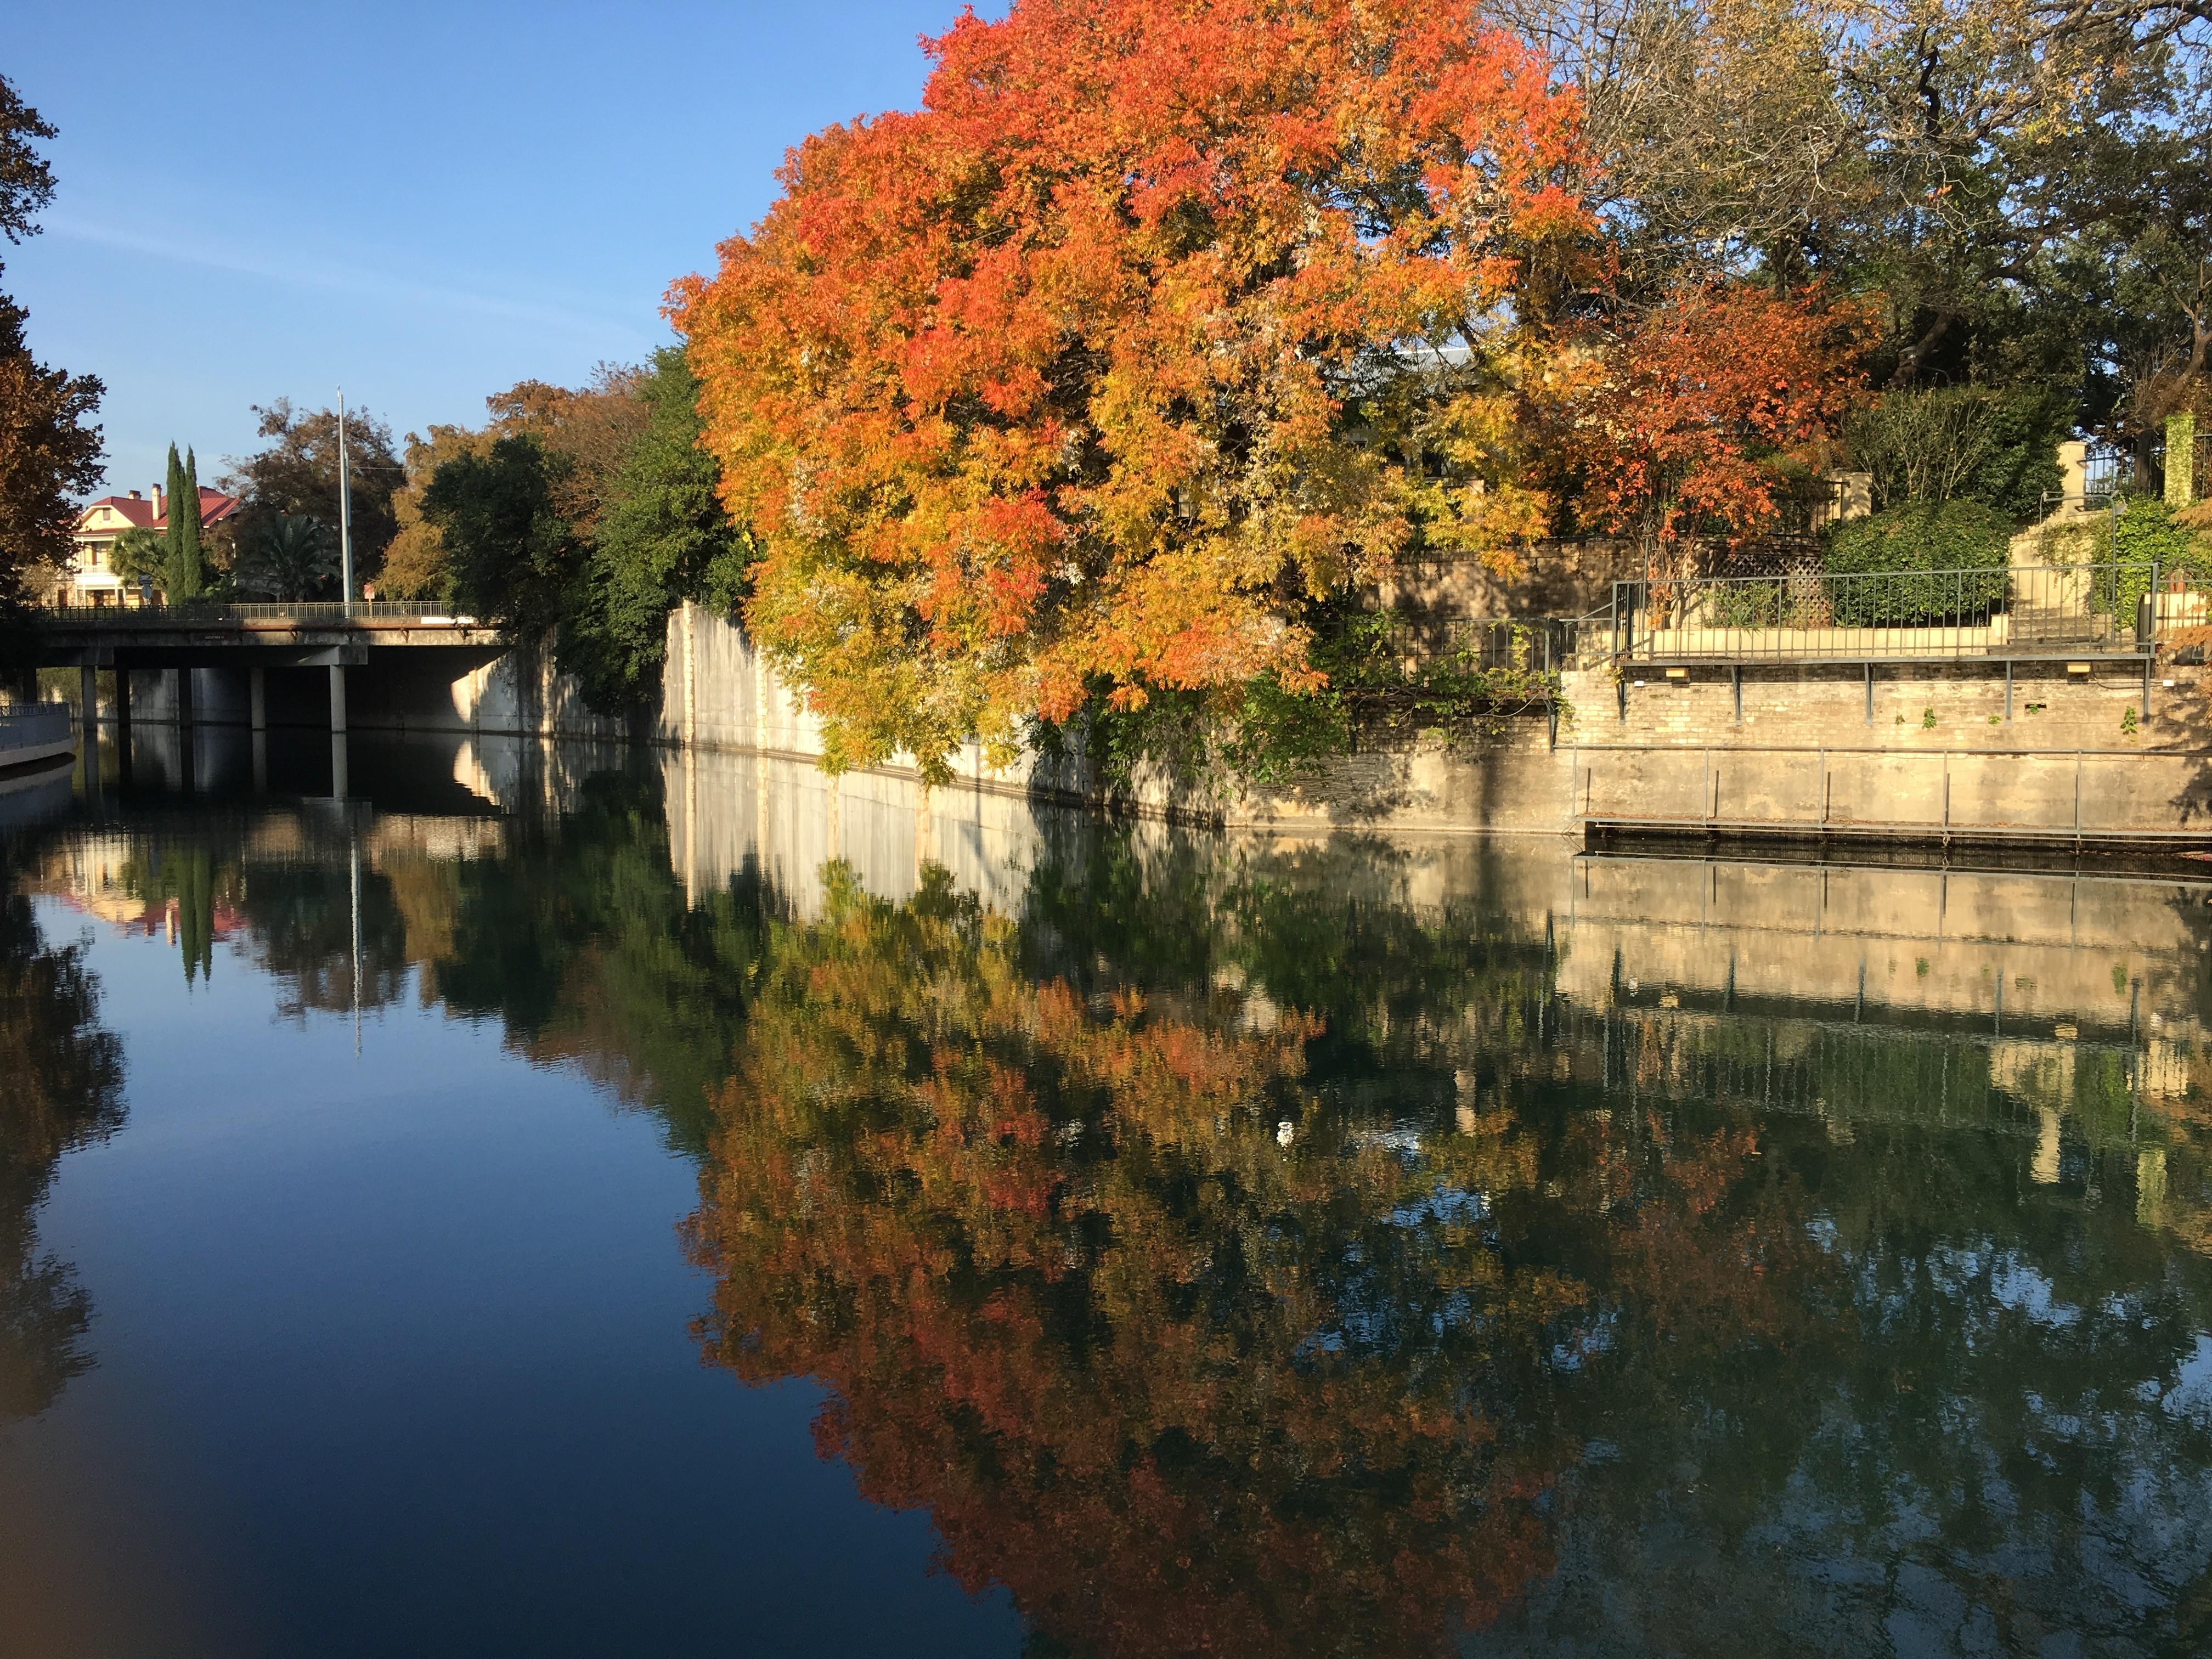 San Antonio River on the King William District